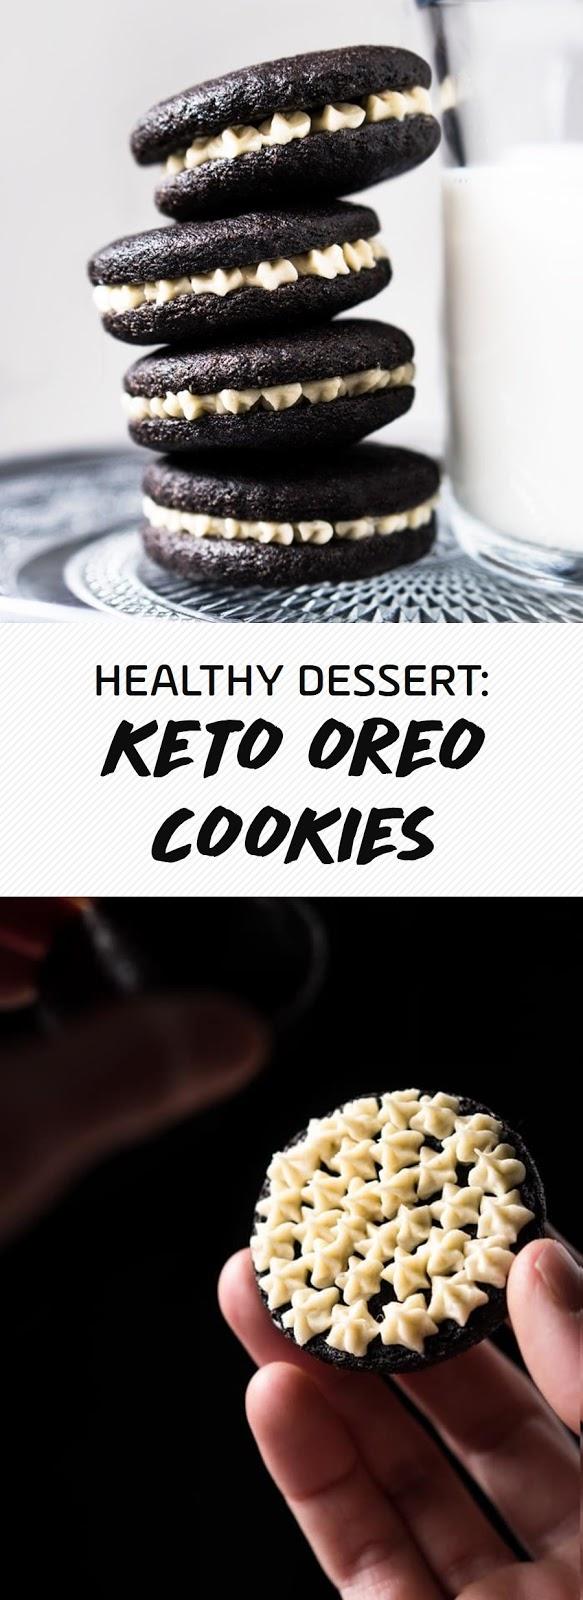 HEALTHY DESSERT:  KETO OREO COOKIES